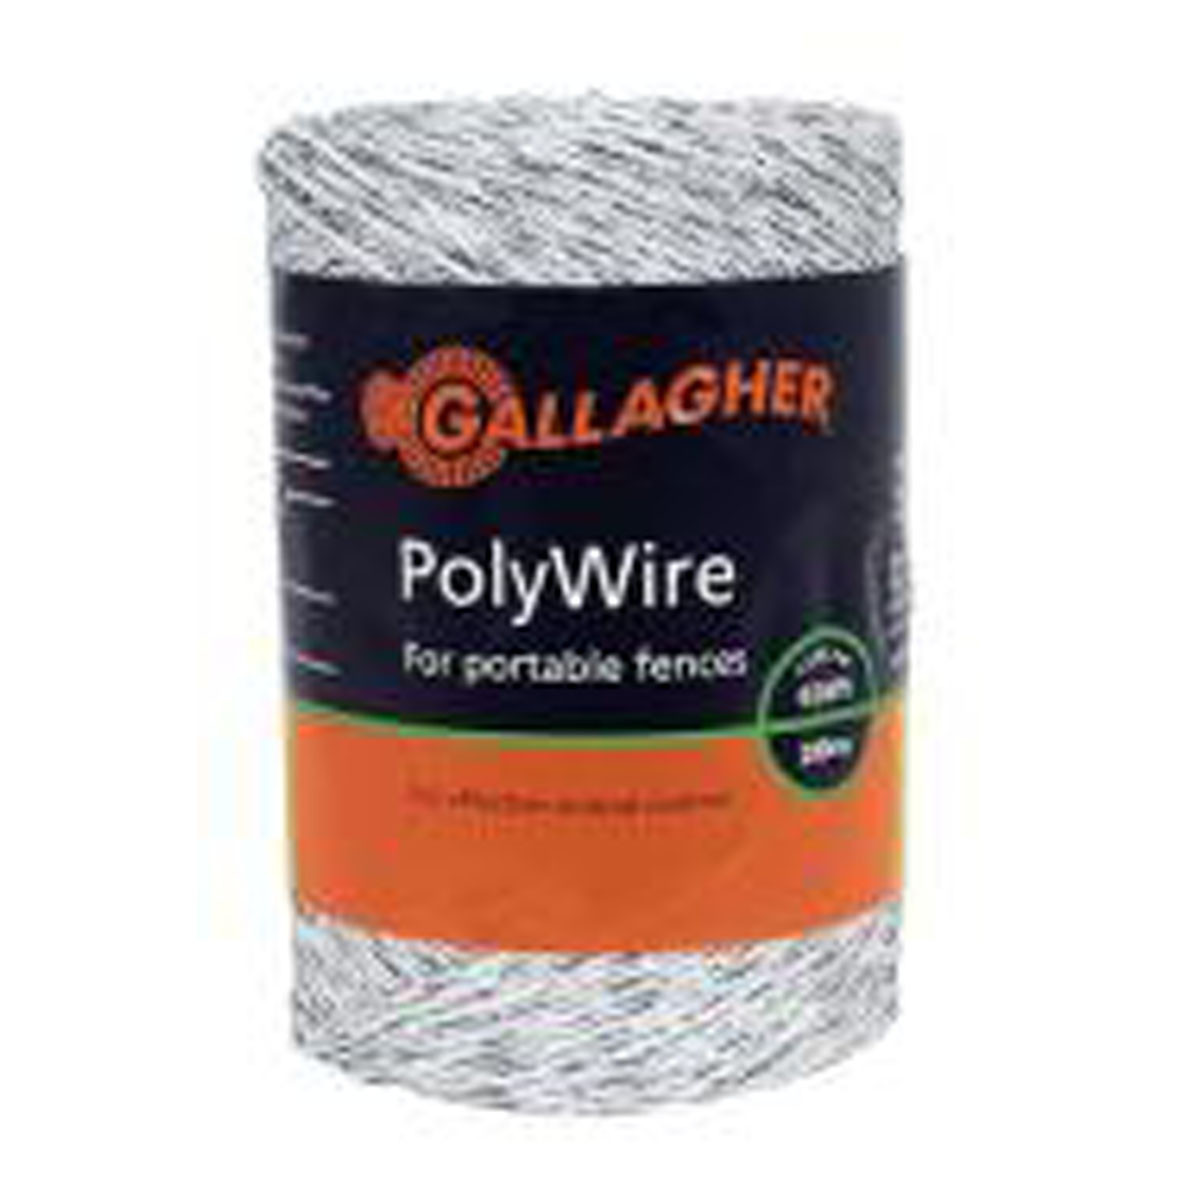 Gallagher Polywire - 200m